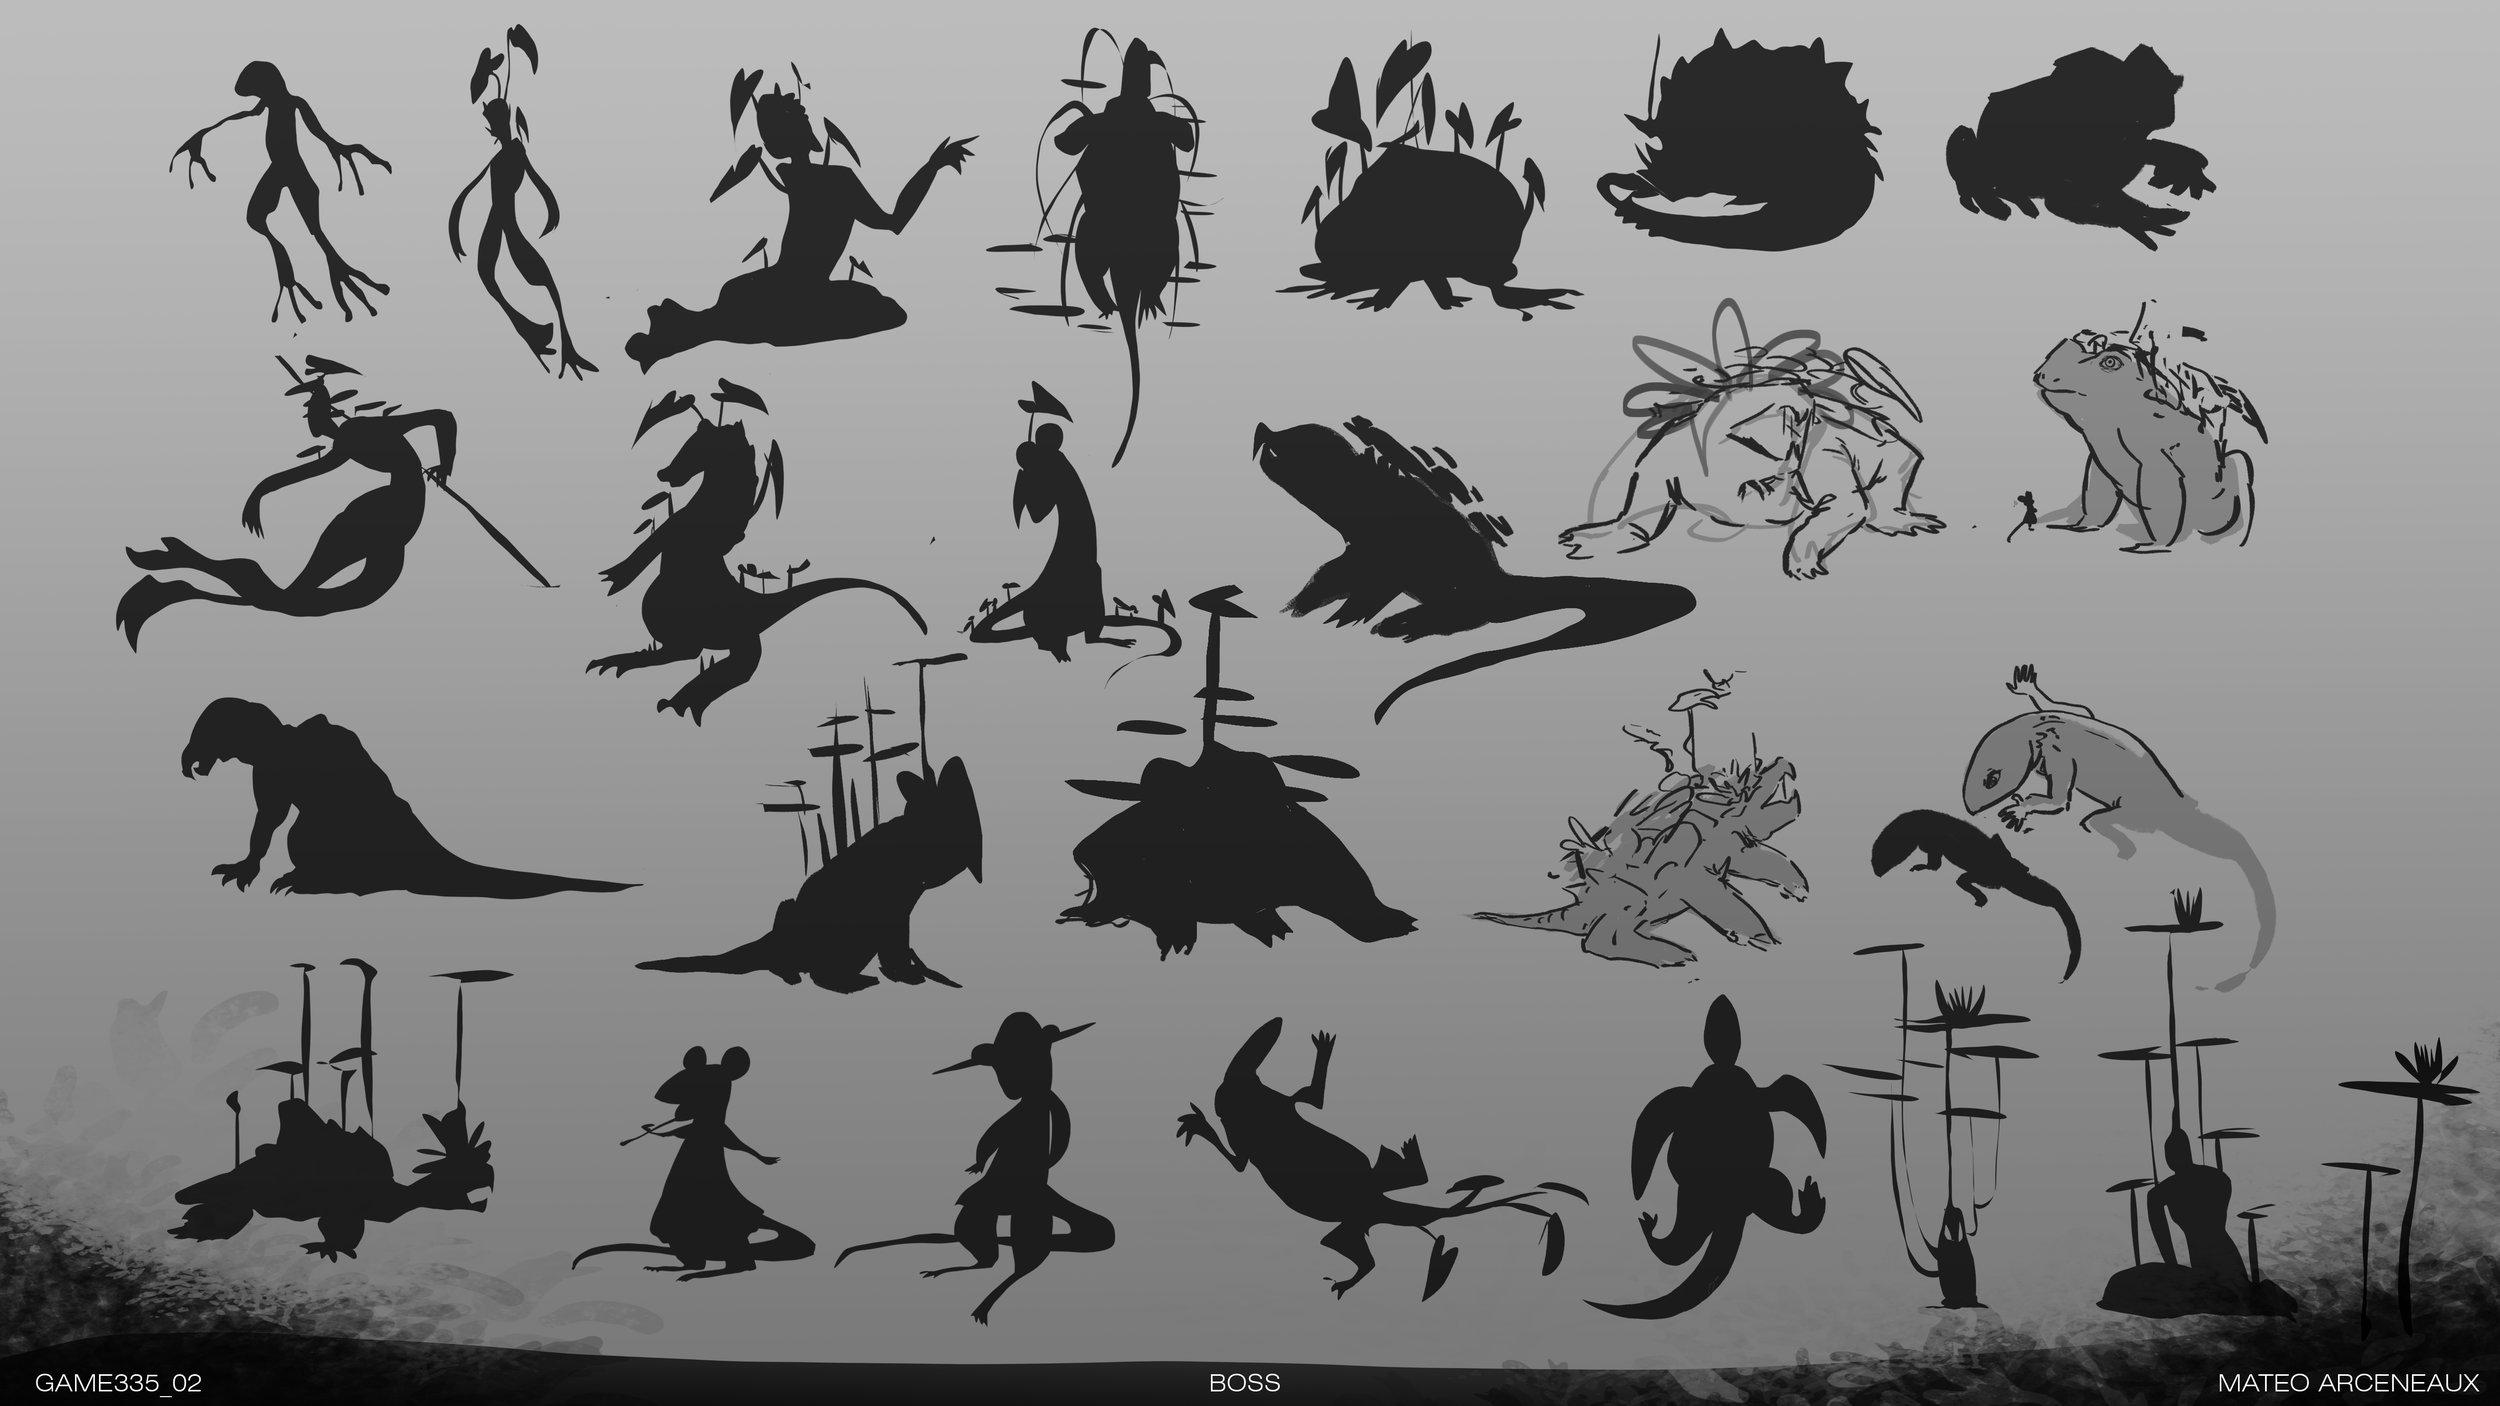 Silouette studies for Boss Creature Concept